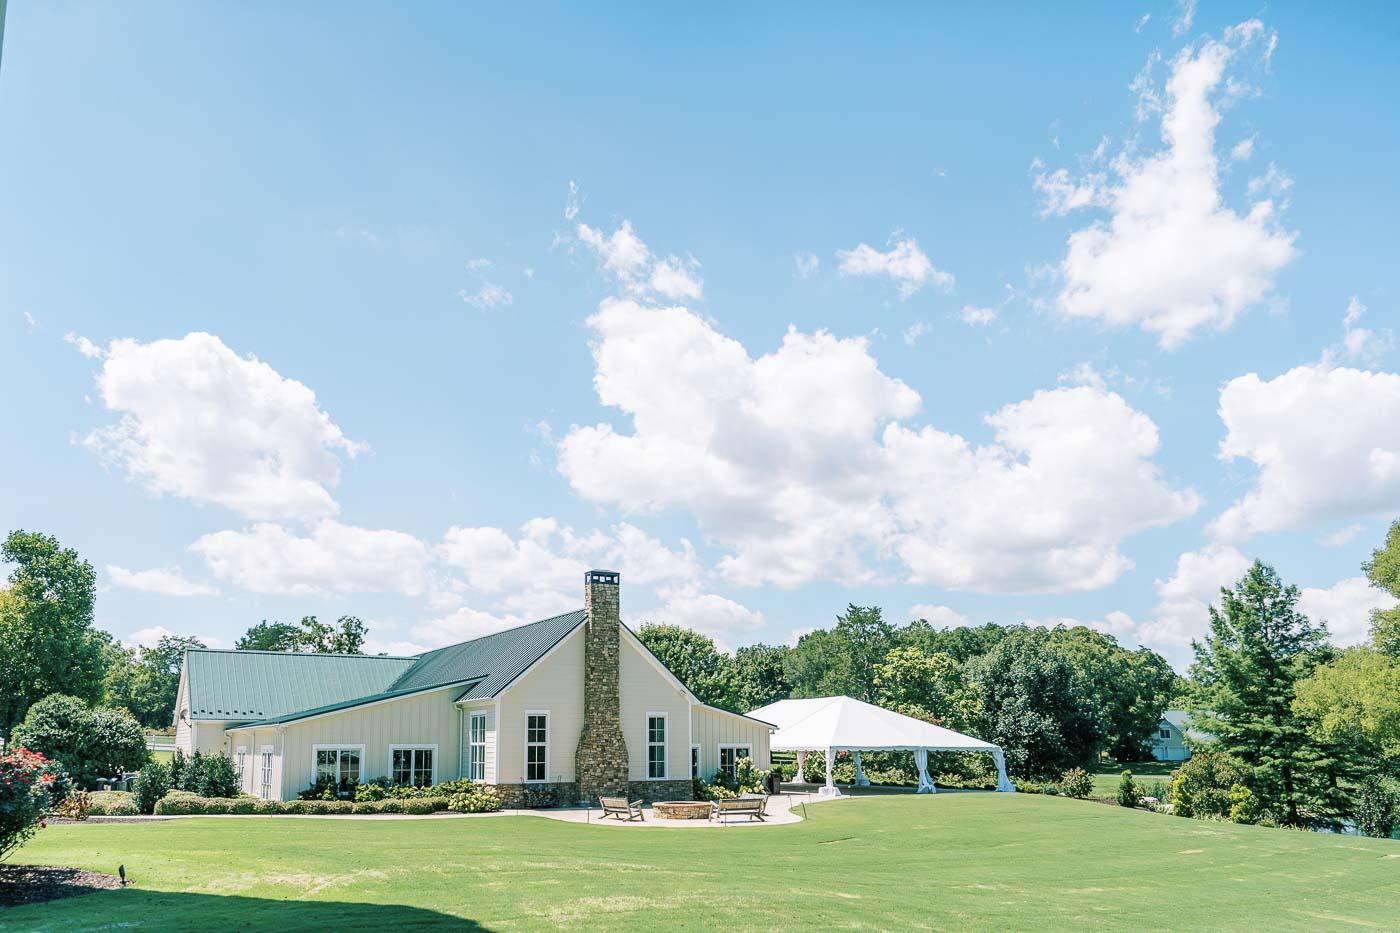 marblegate farm in Knoxville tn